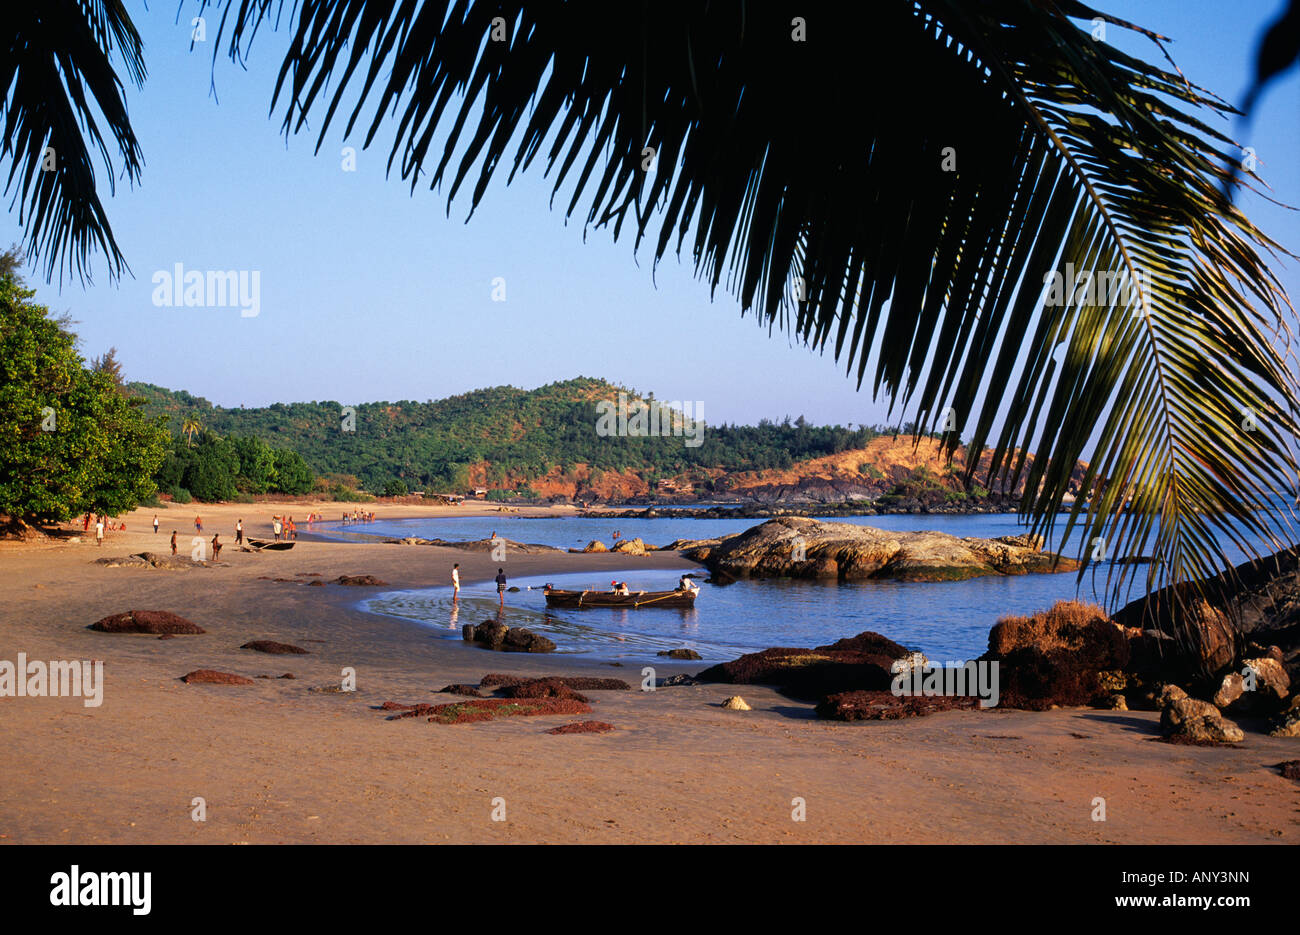 India, Karwa District, Gokarna. Om Beach - one of several beaches outside the pilgrimage town of Gokarna. - Stock Image